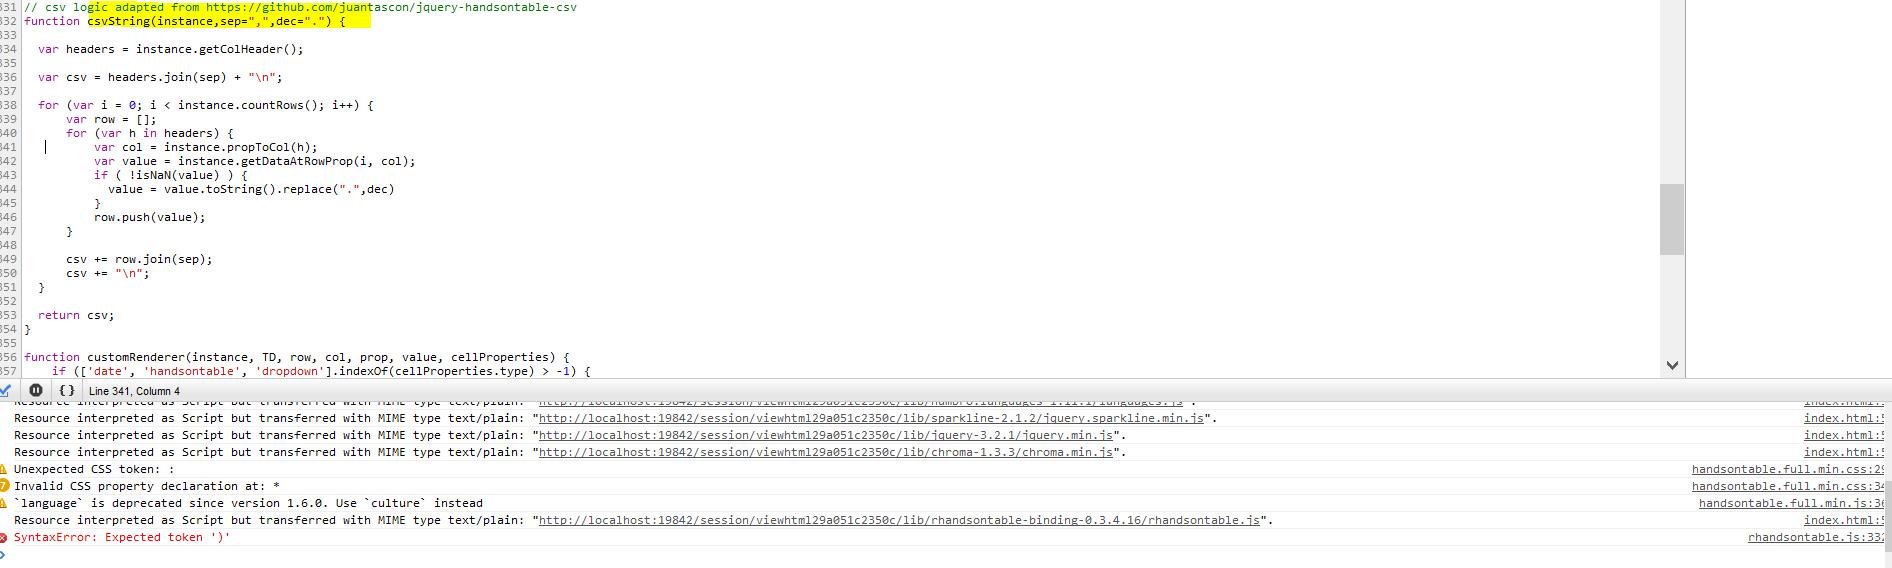 Github dev version not rendering table · Issue #210 · jrowen